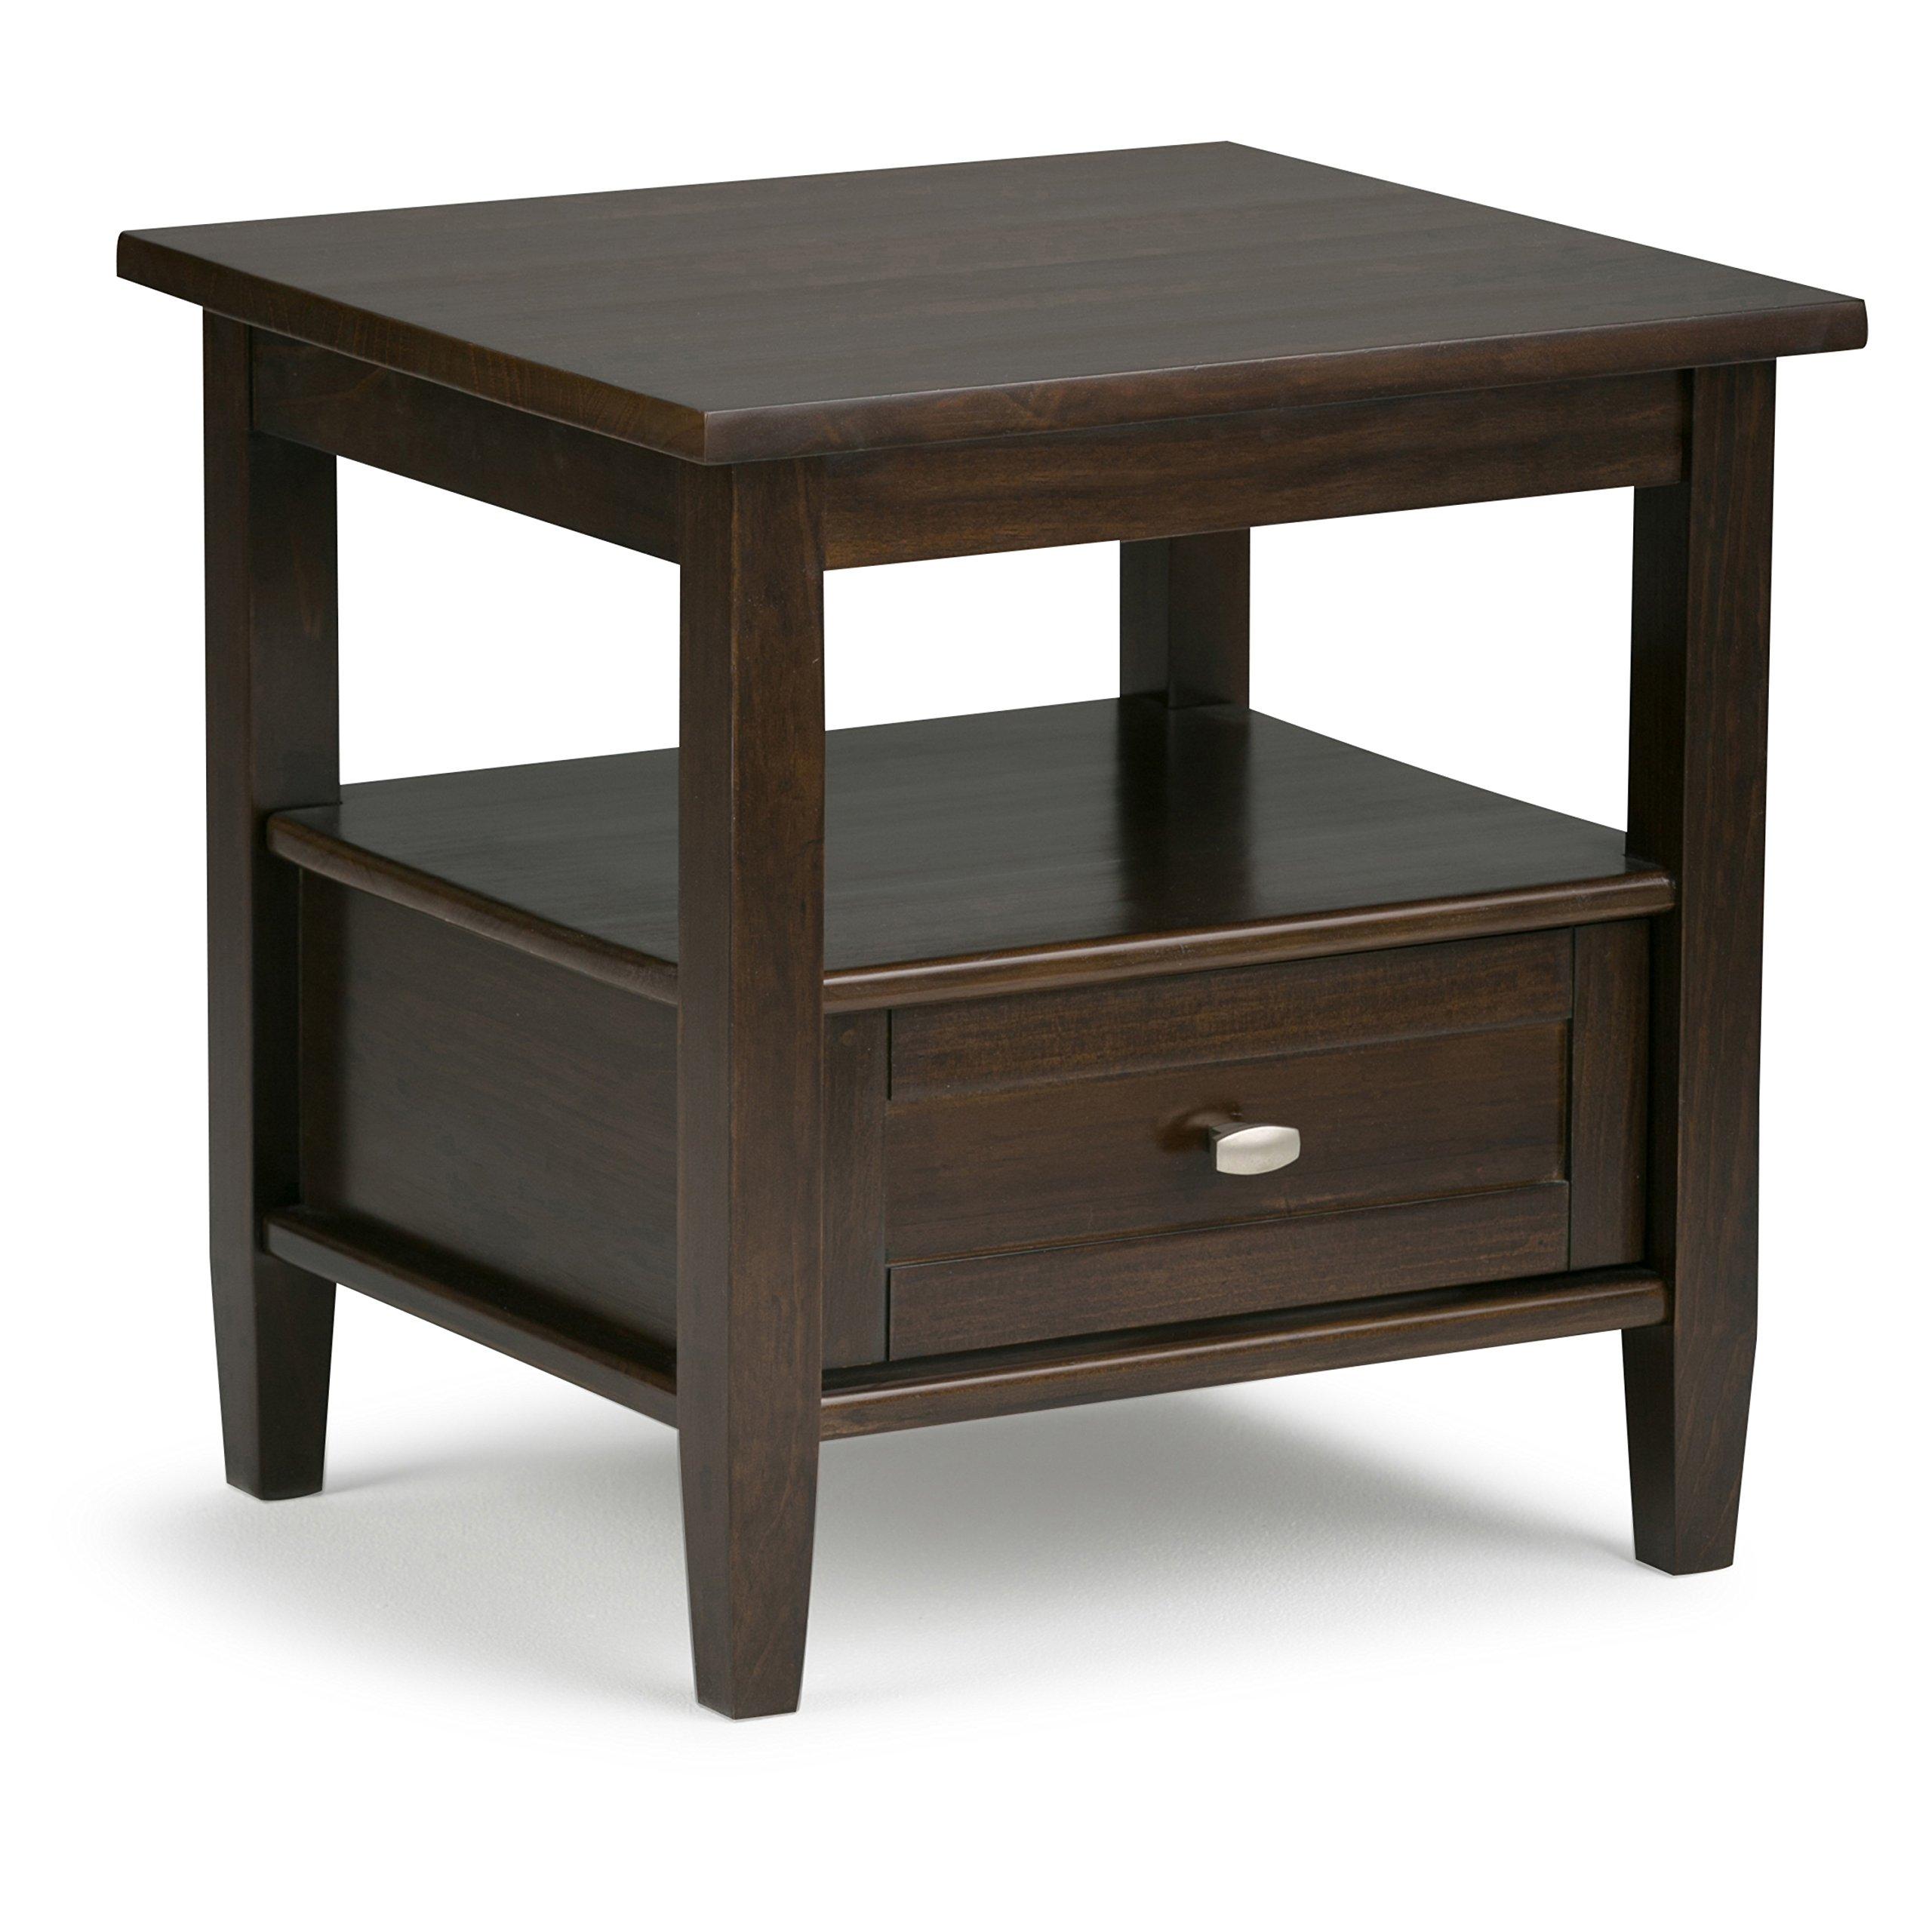 Simpli Home Warm Shaker End Side Table, Tobacco Brown